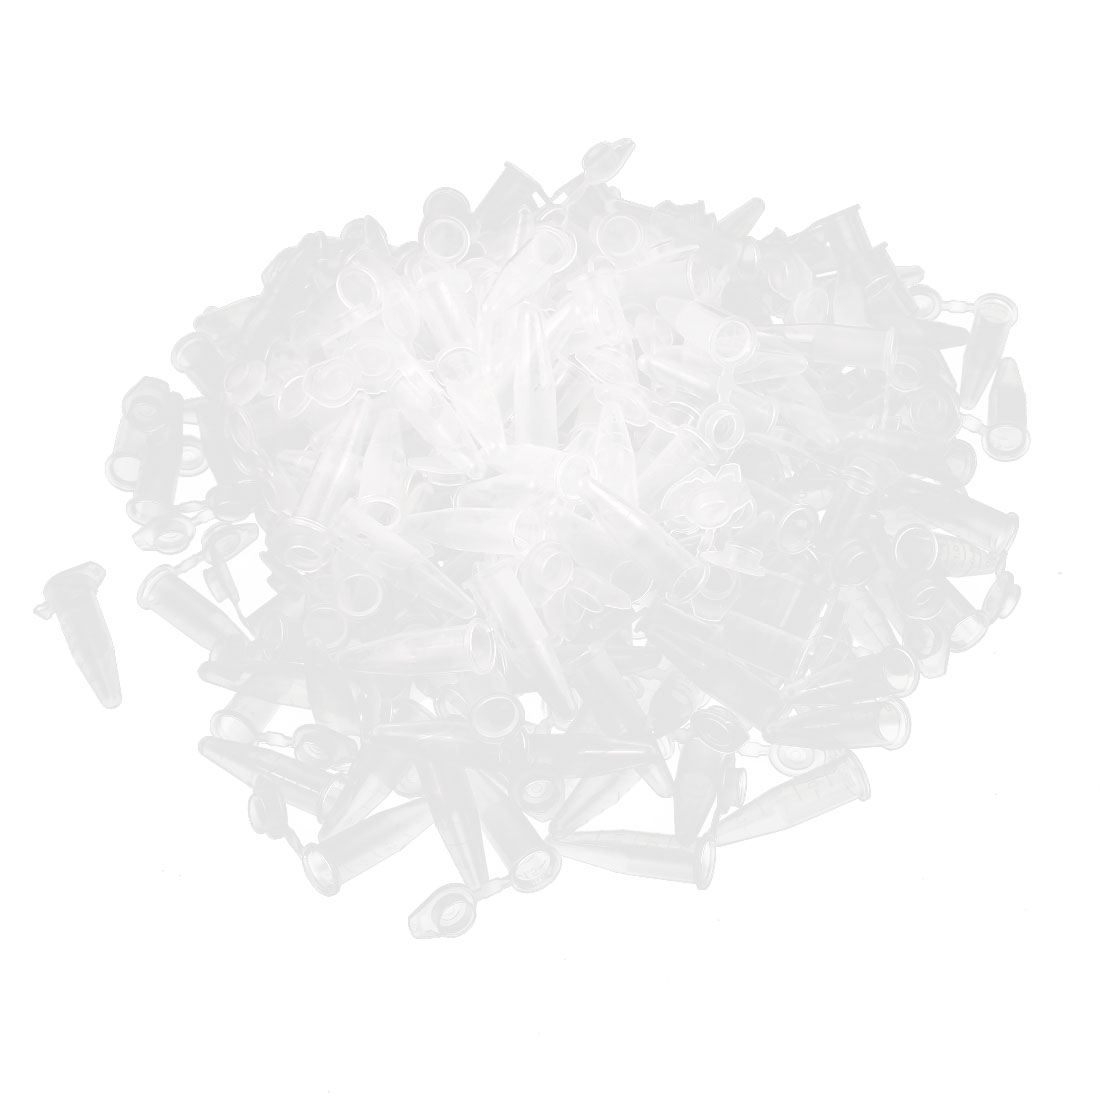 200Pcs 1.5ml Plastic Clear EP Tube Centrifuge Tubes for Laboratory w Graduated